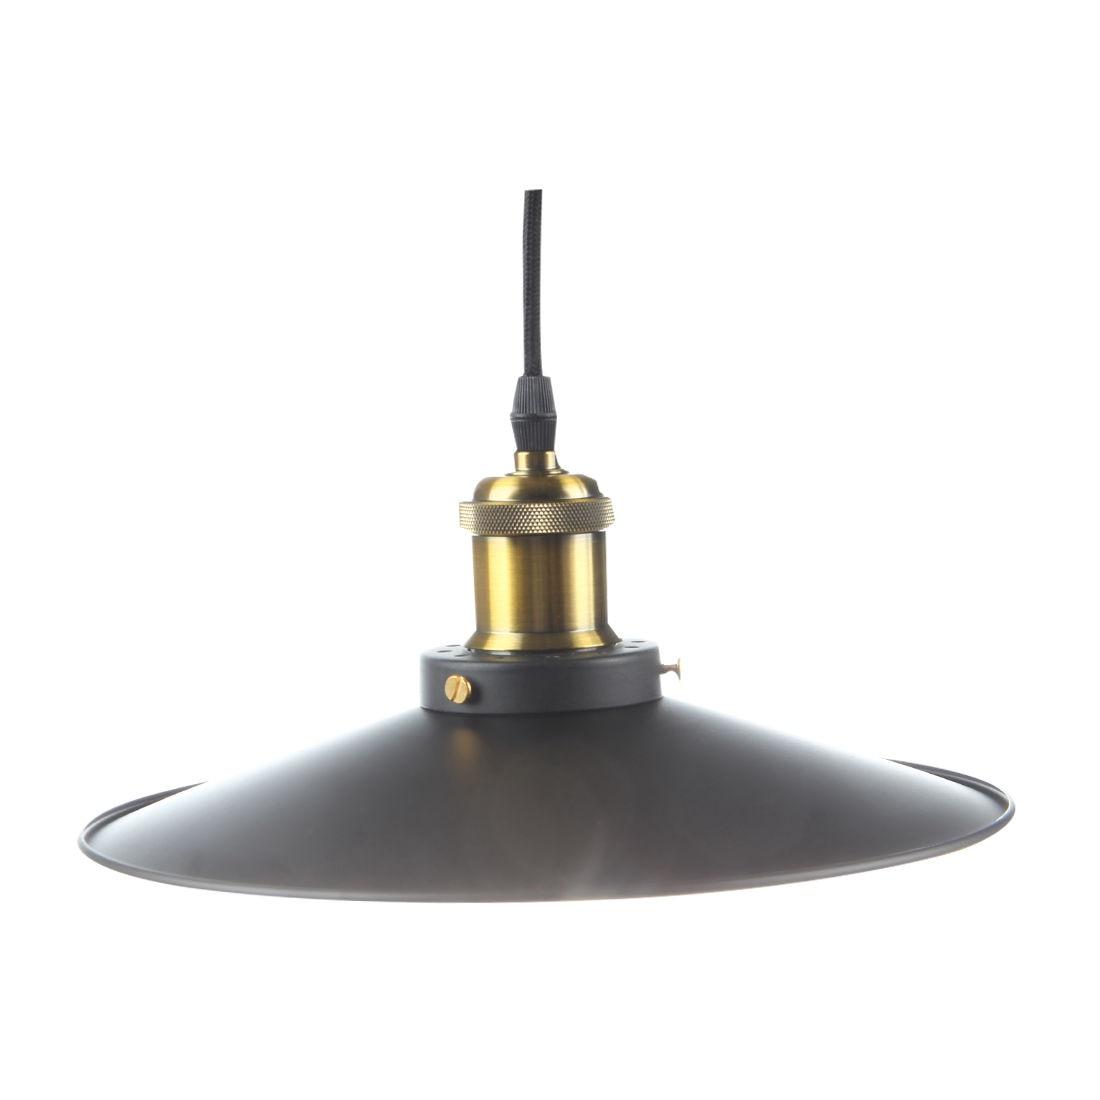 Retractable Hanging Light Vintage Loft Industrial Pendant Lights Adjustable Max Drop 1.5m Wire Lamps (diameter 26cm cable lengthRetractable Hanging Light Vintage Loft Industrial Pendant Lights Adjustable Max Drop 1.5m Wire Lamps (diameter 26cm cable length